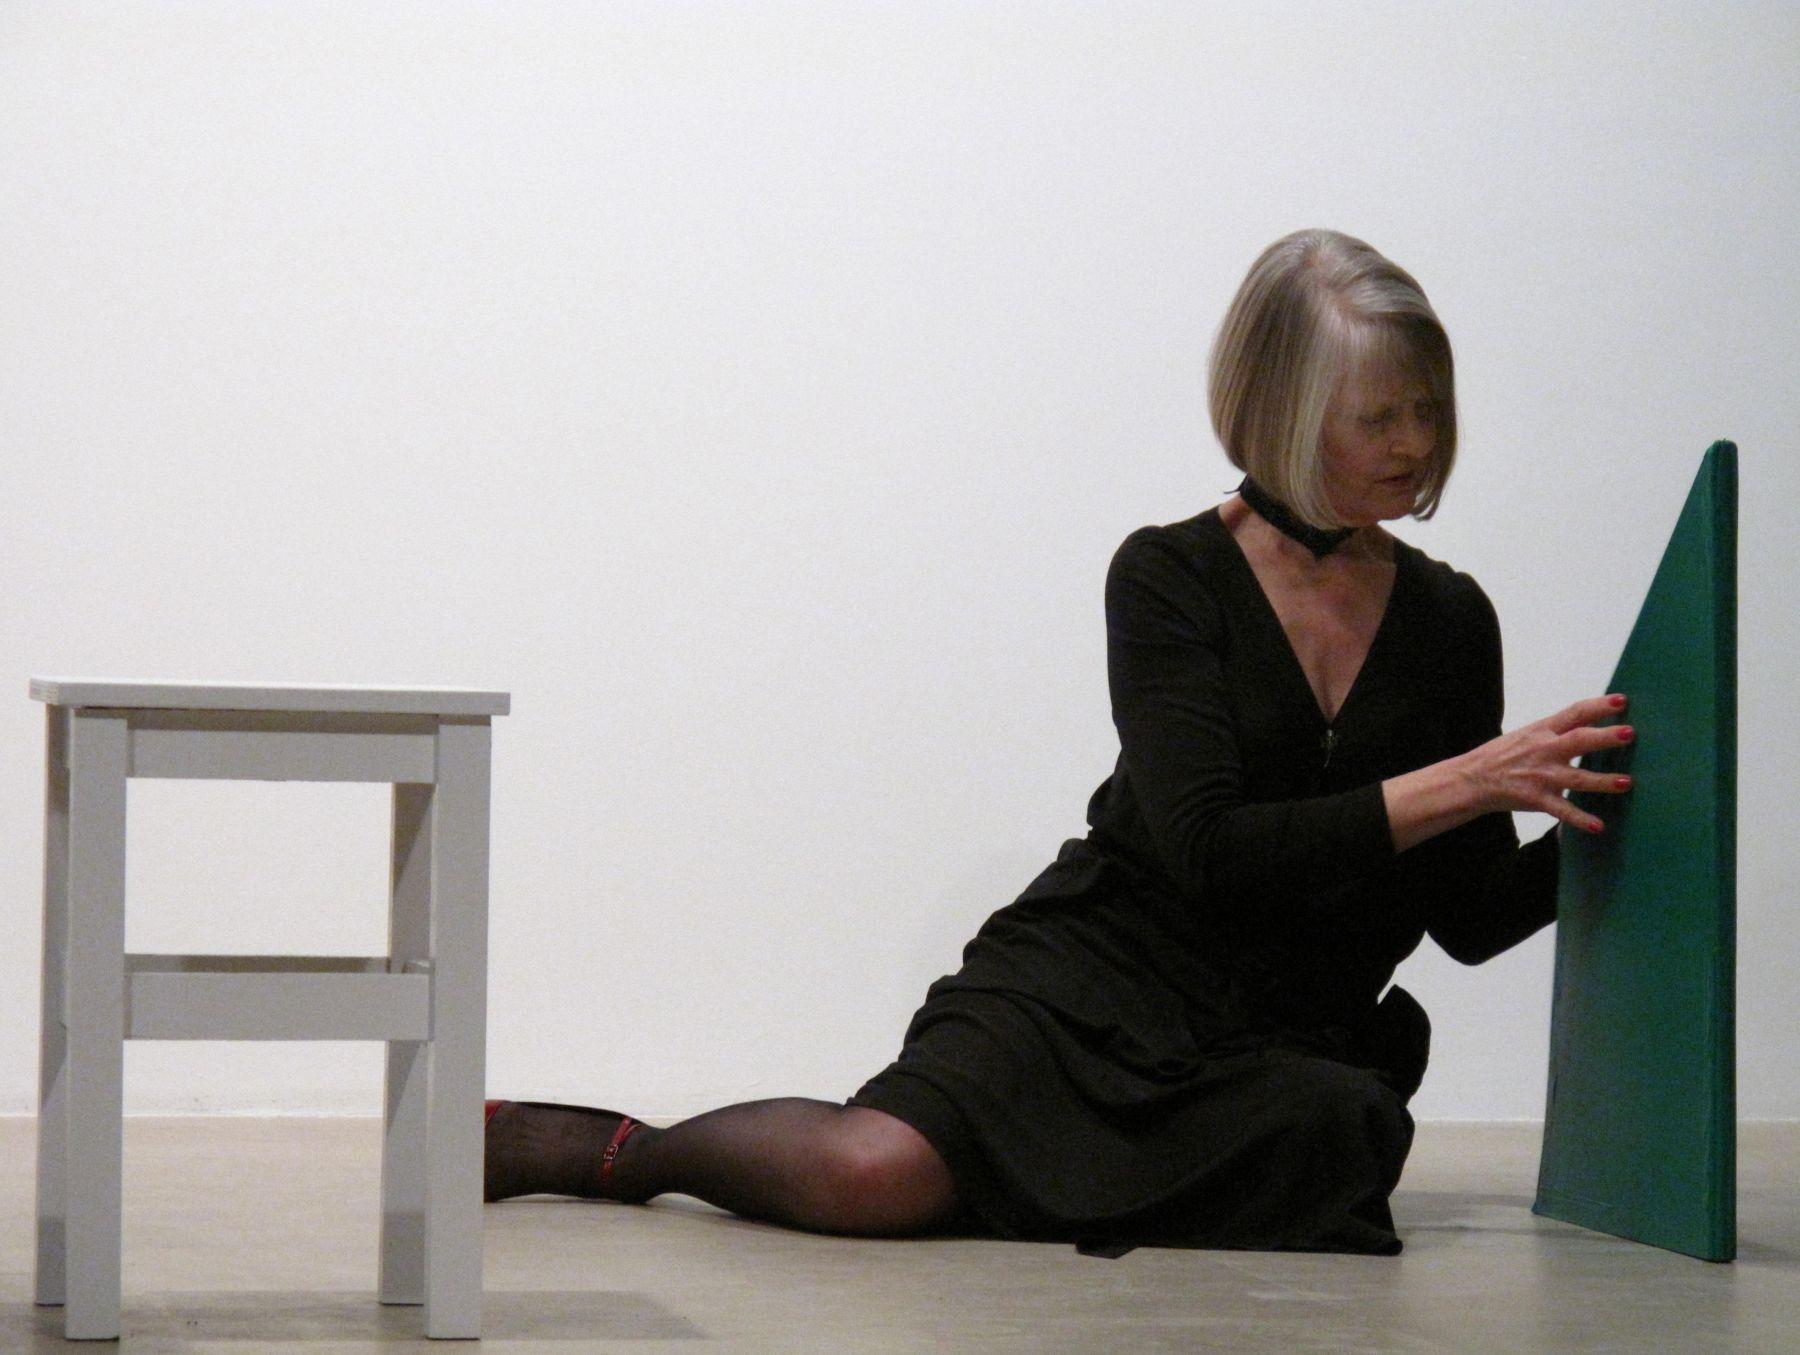 Performance view, Greene Naftali, New York, February 4th, 2009